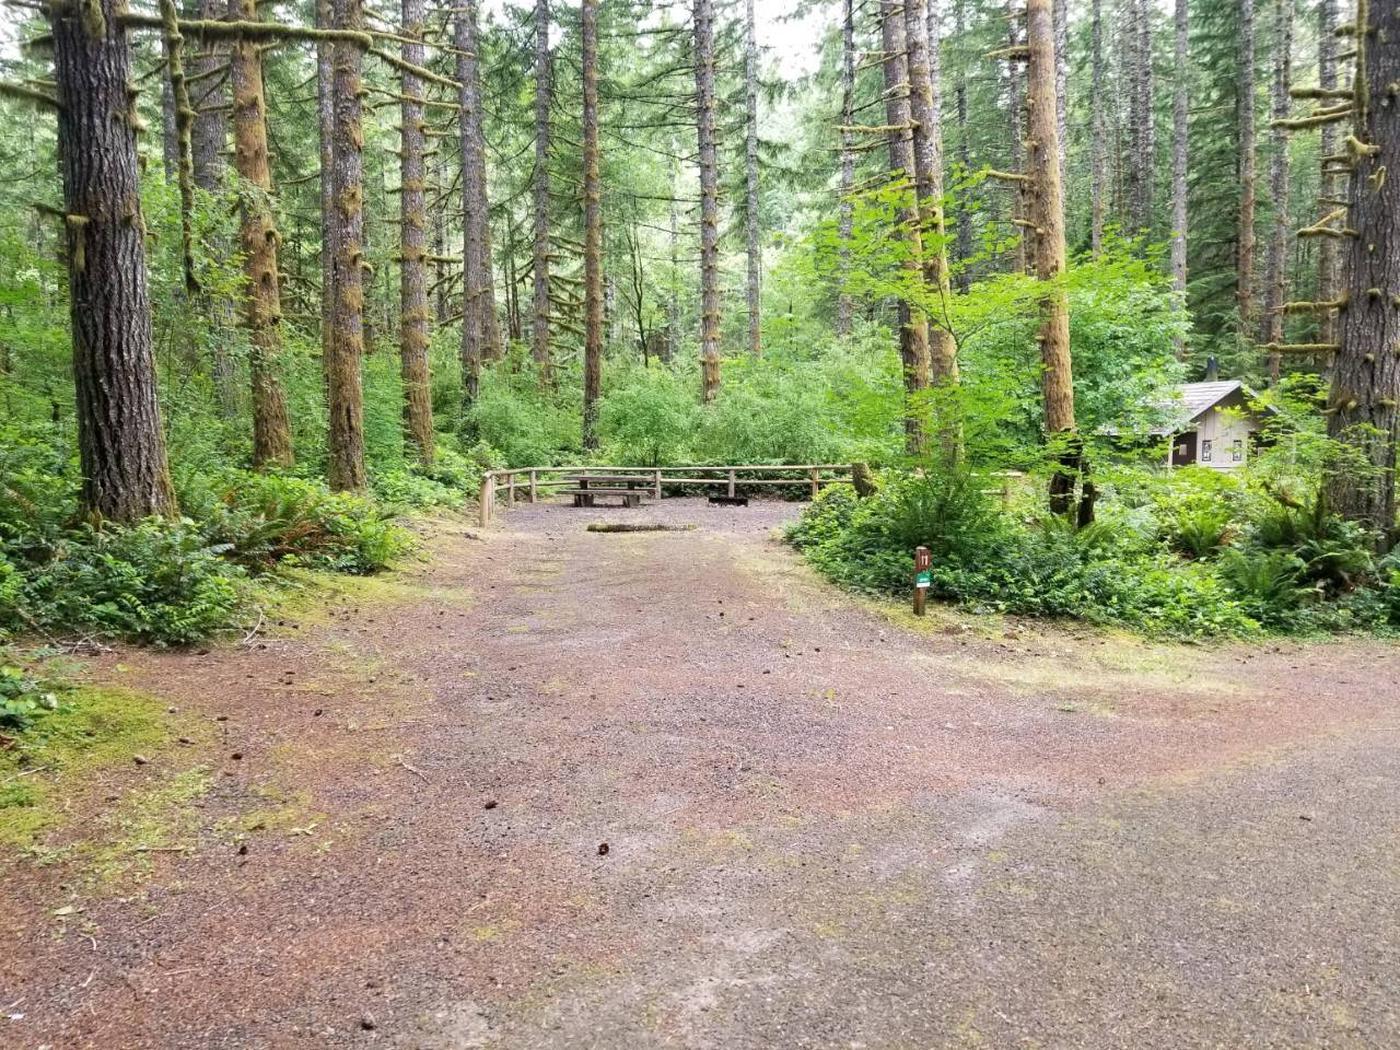 Camp Site #11 Street ViewSite #11 Street View